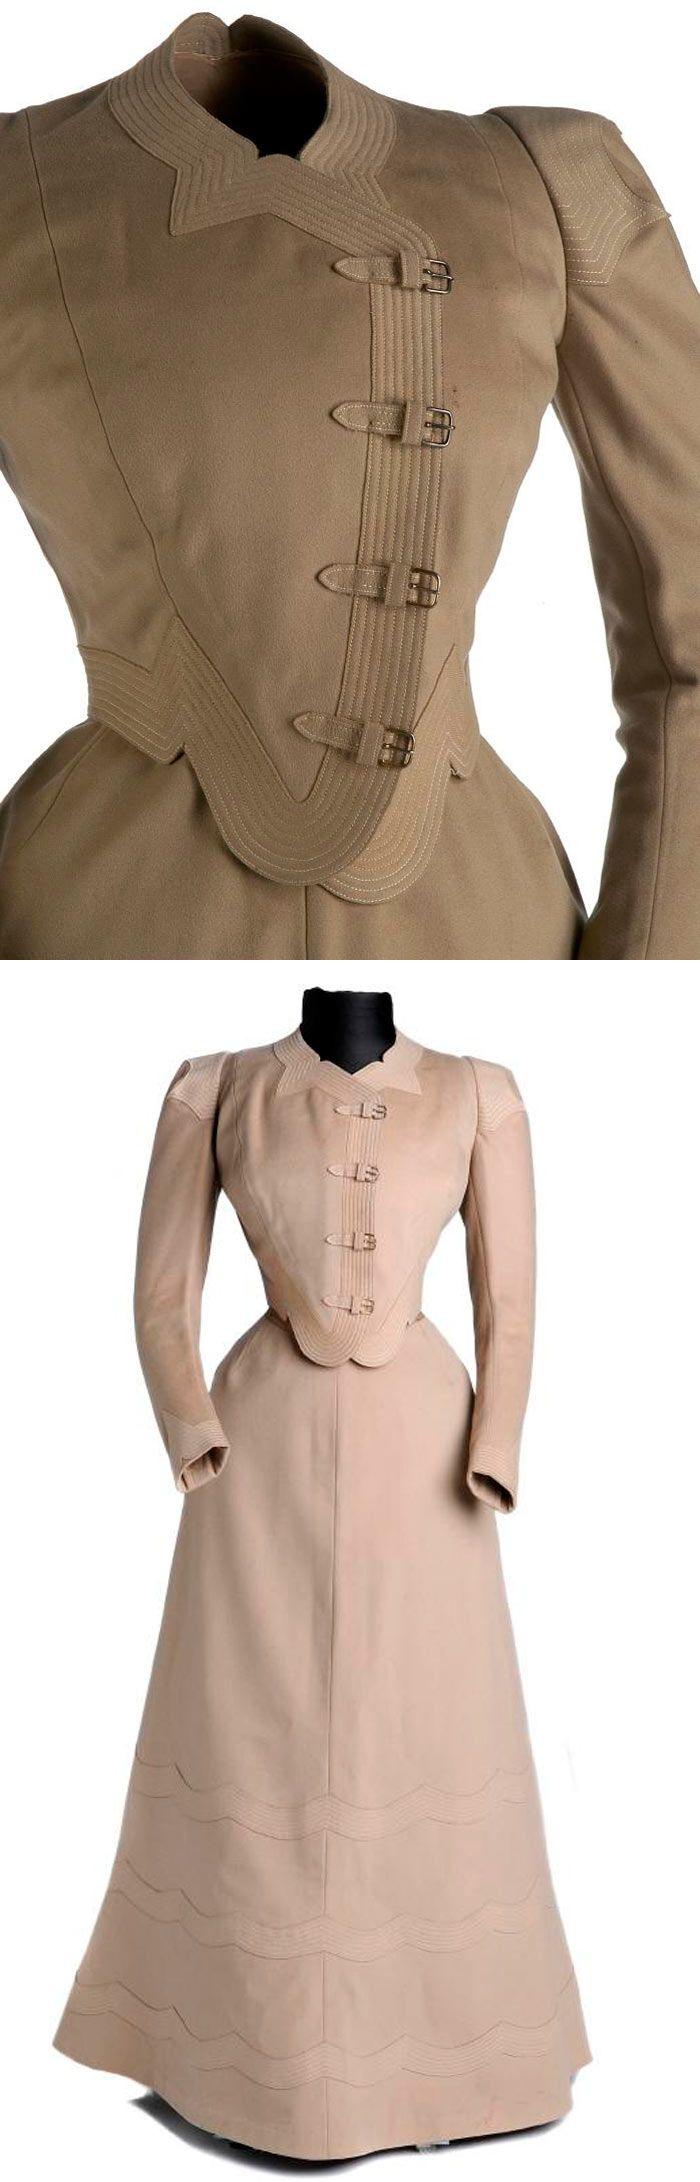 designer handbags sale  Laura Frantz  Author on Exquisite historydress